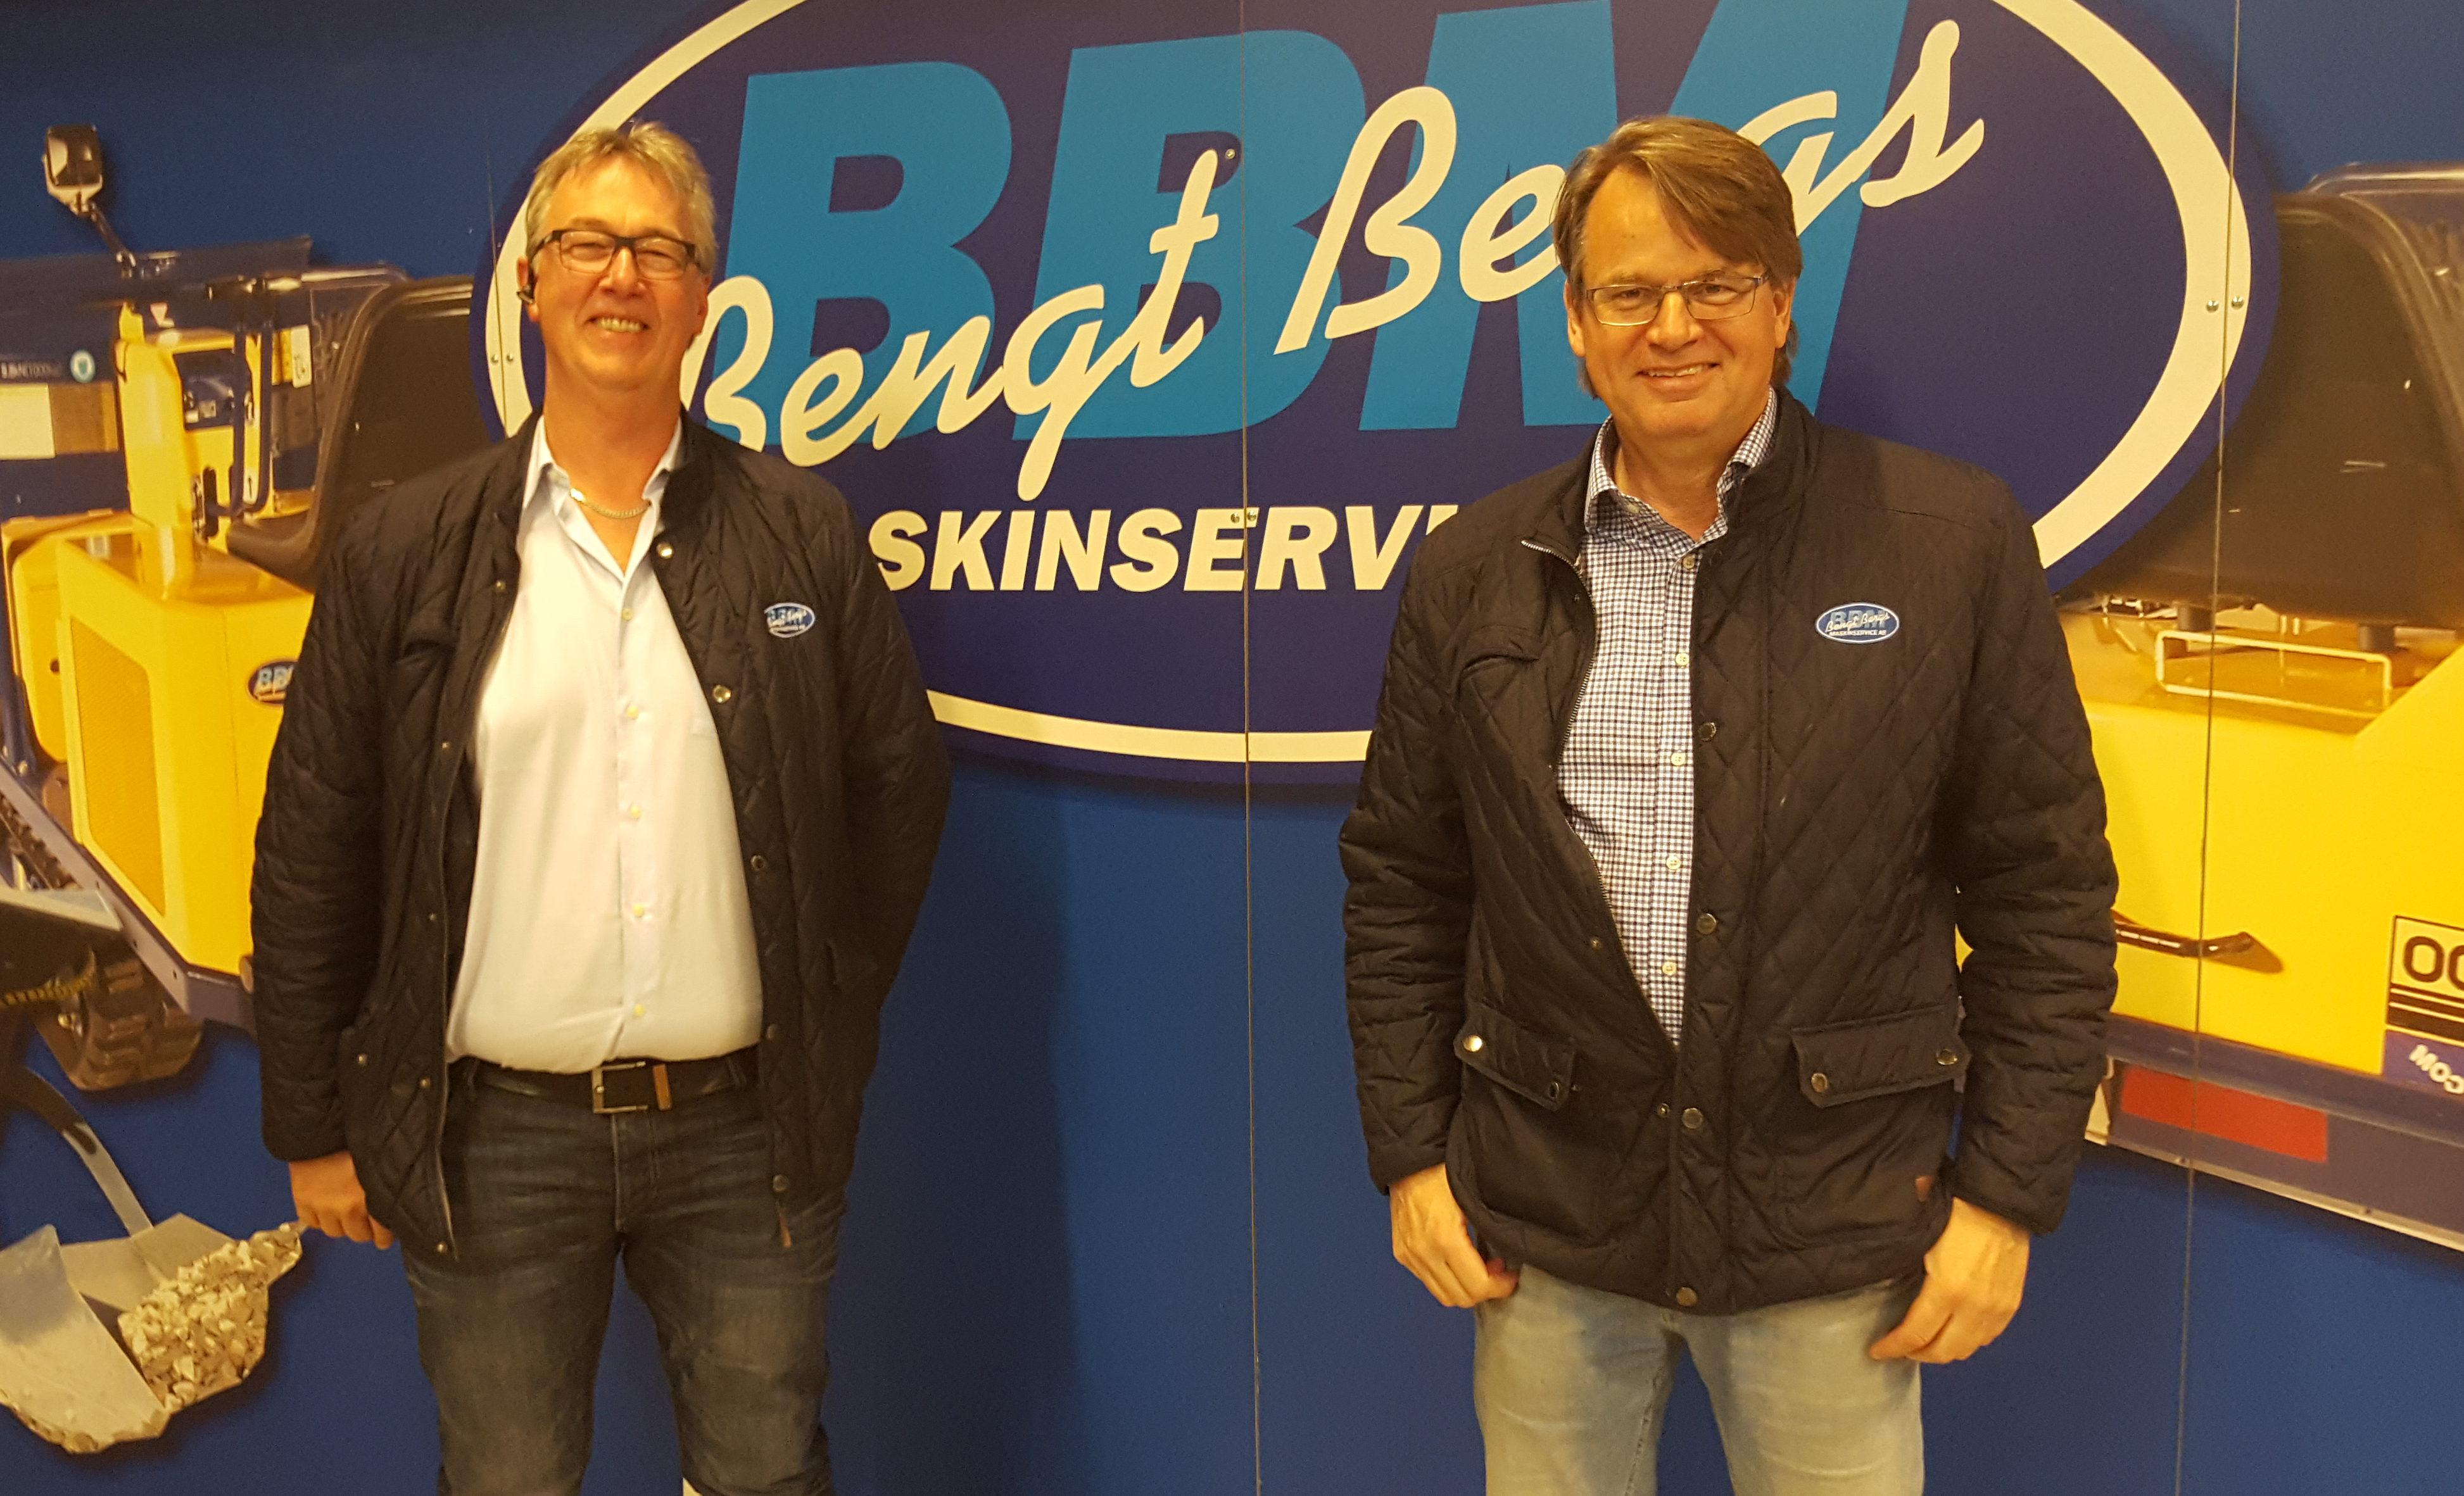 Bengt Berg, Jörgen Svensson